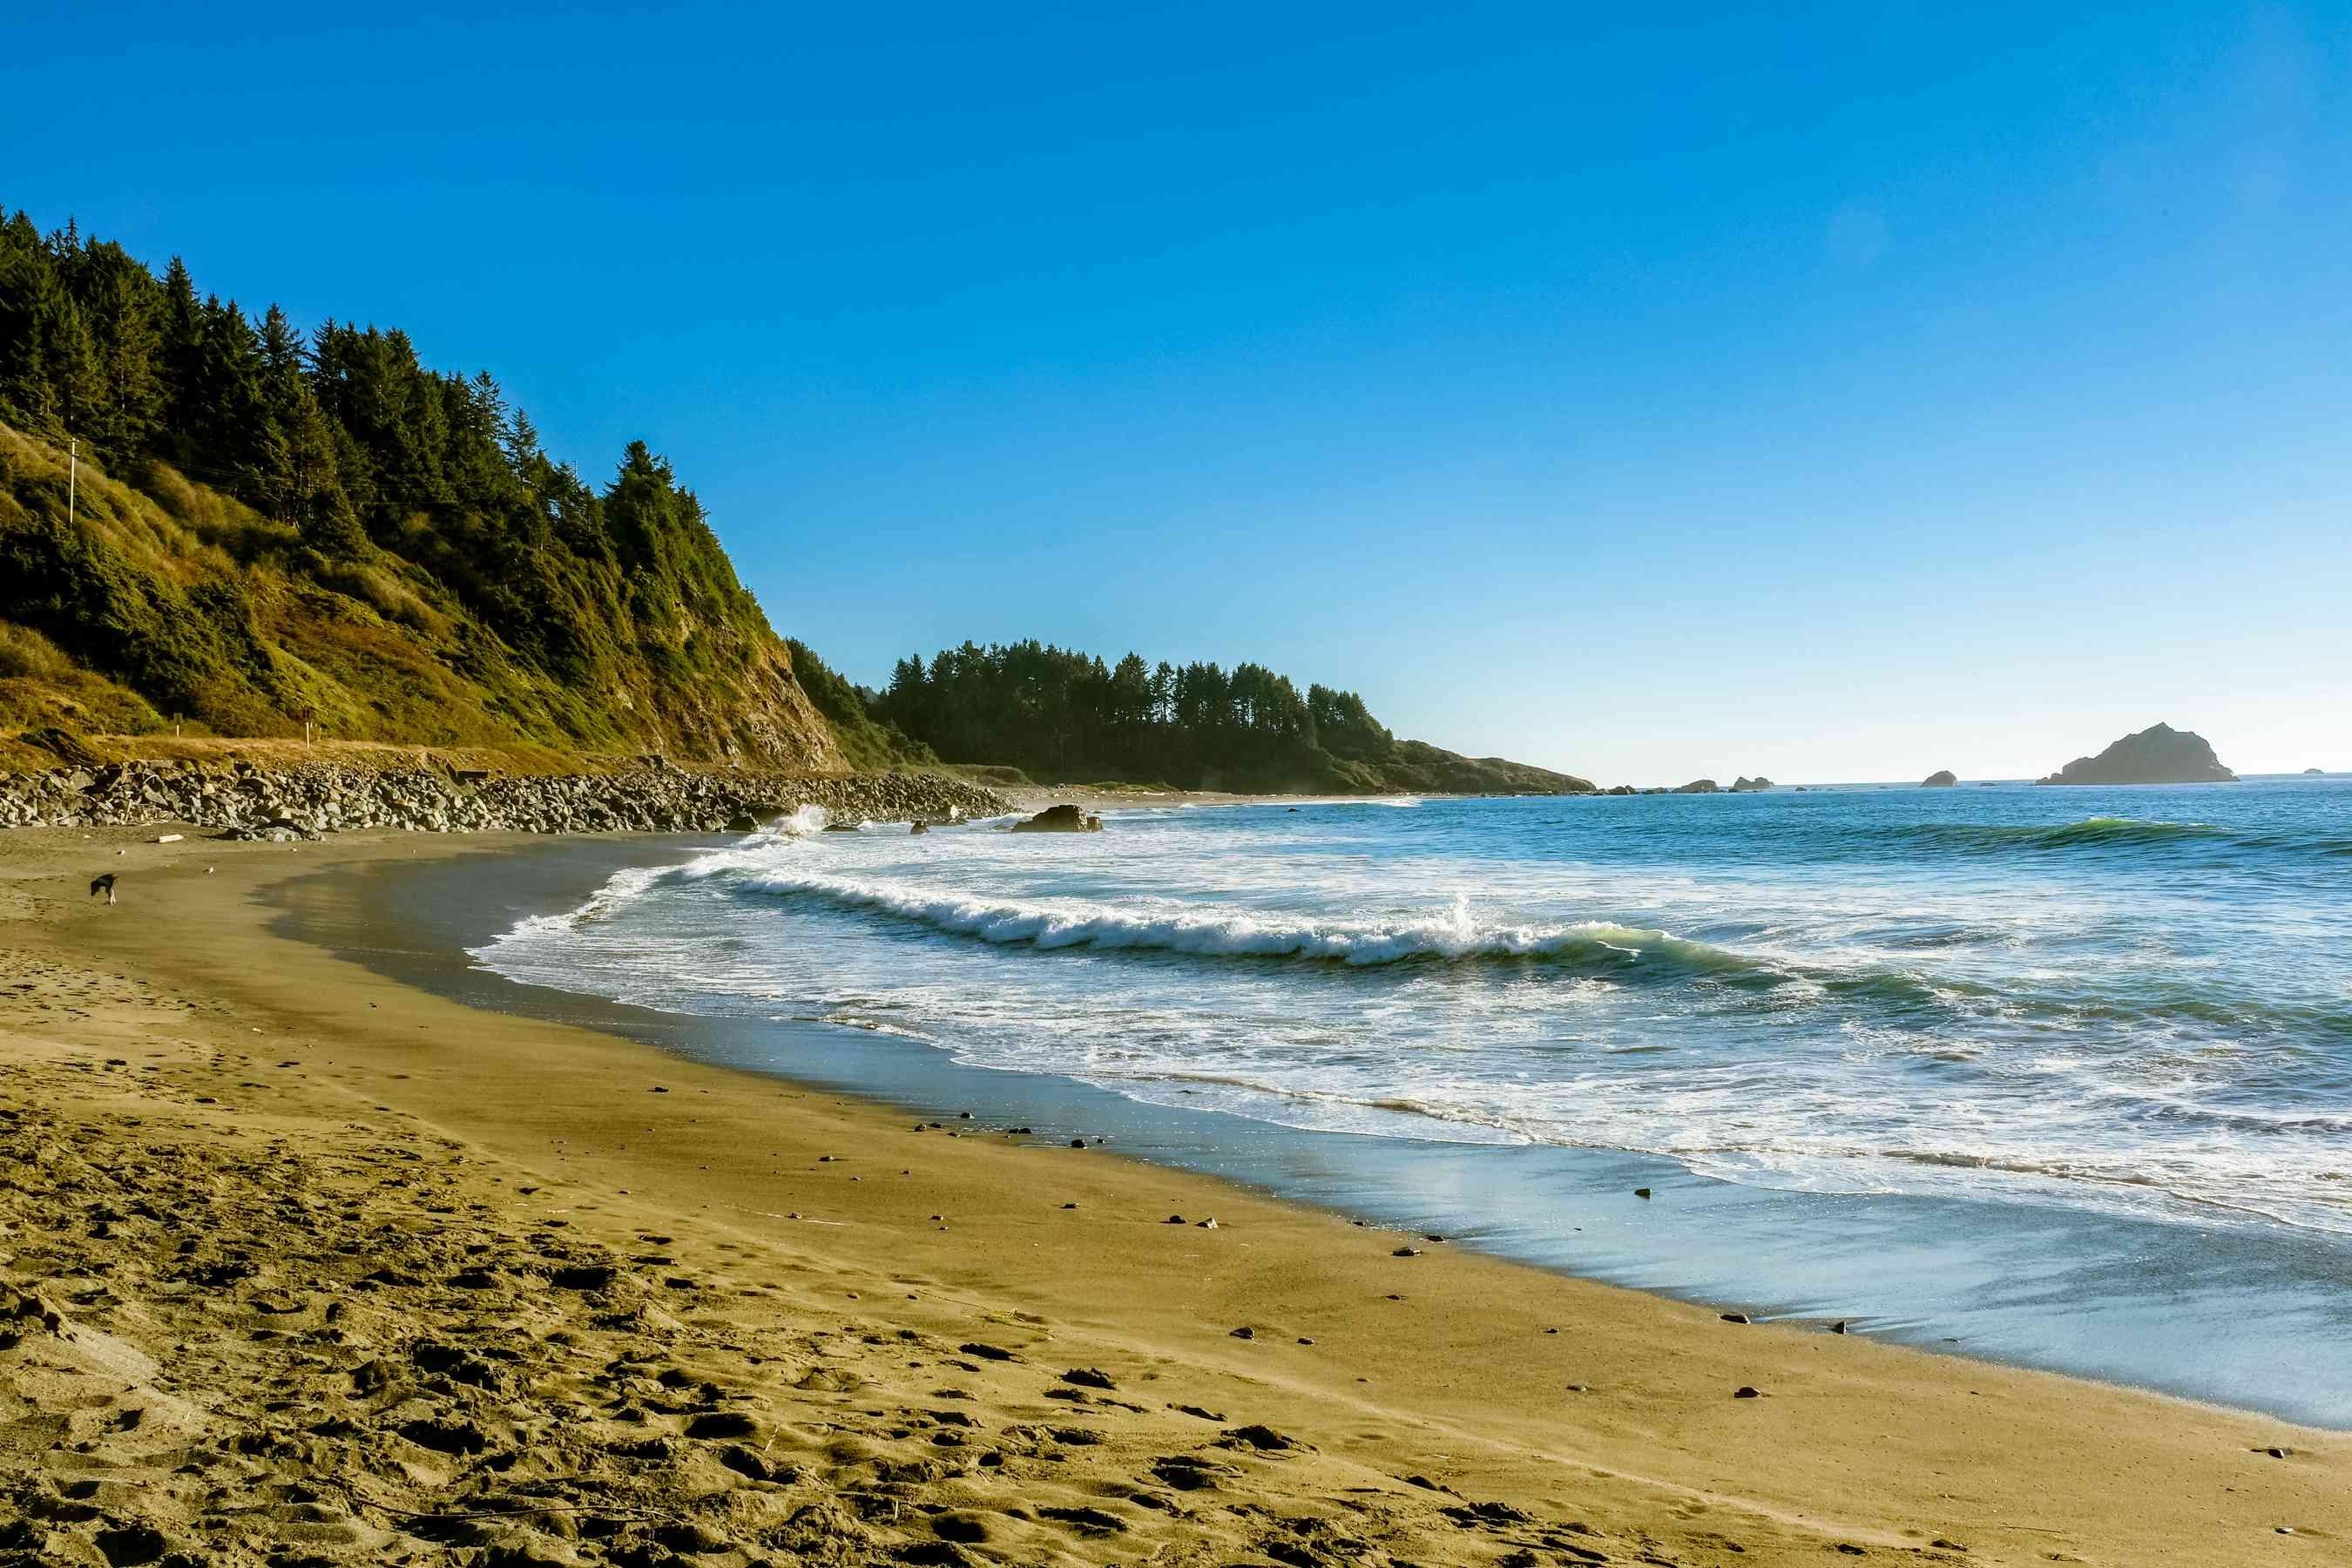 A beach along the Redwood National Park